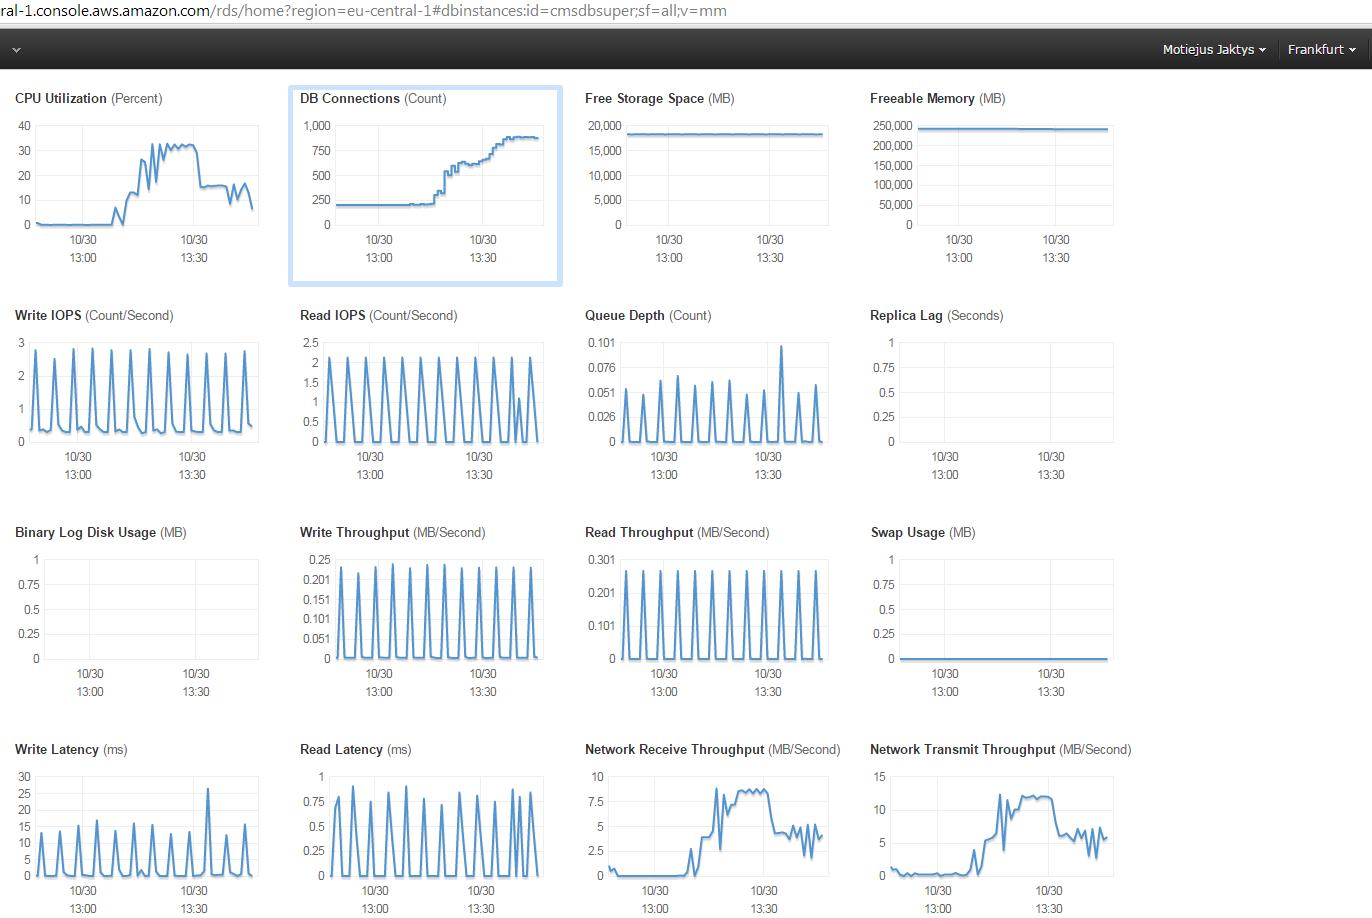 DB usage graphs